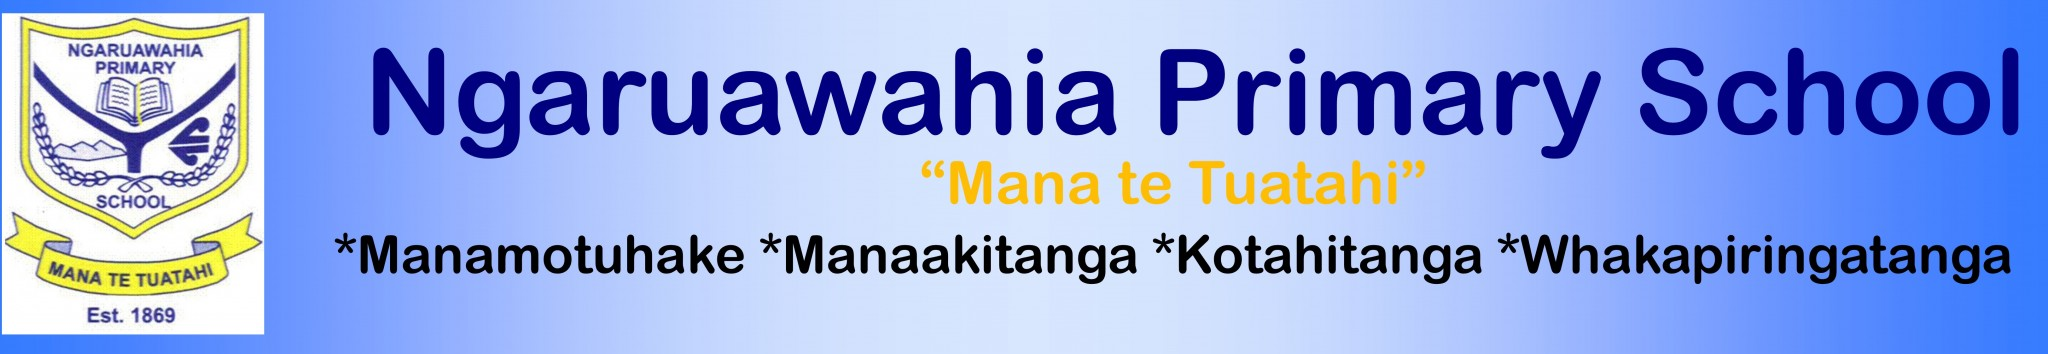 Ngaruawahia Primary School Logo